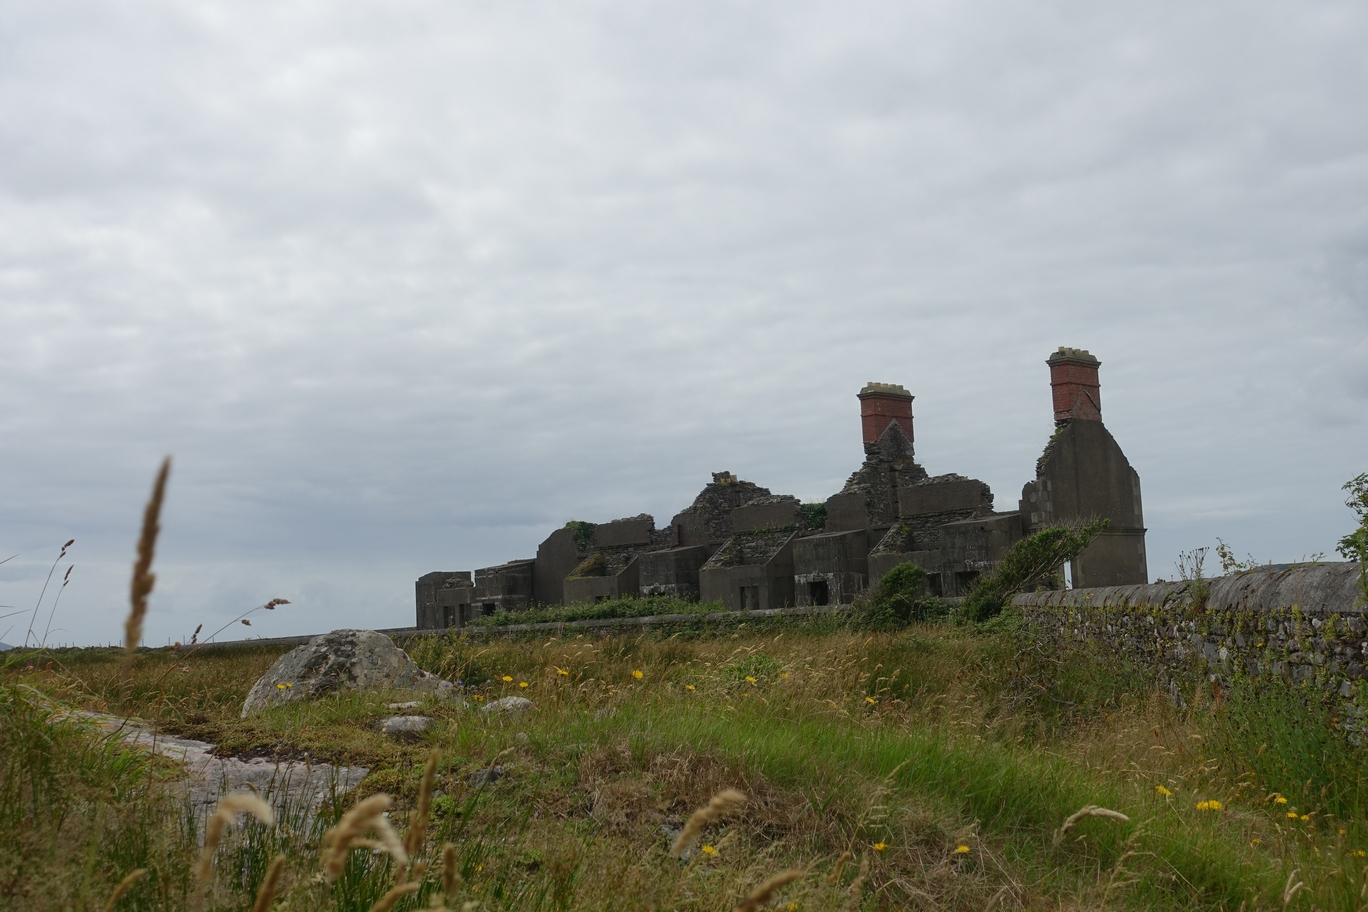 Coastguard Houses